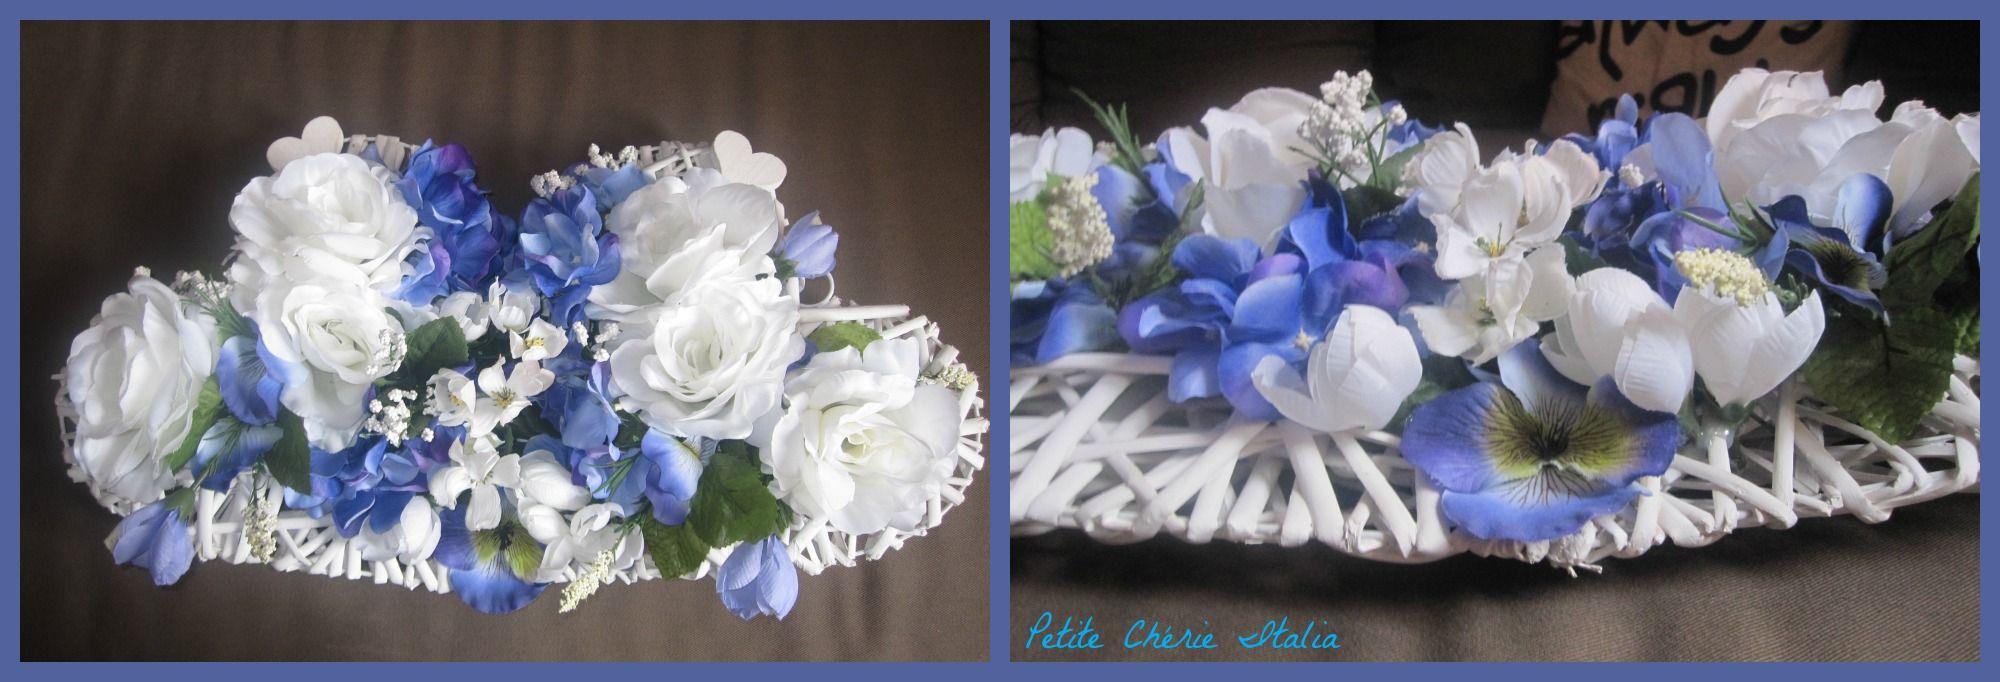 Centrotavola ghirlanda fiori artificiali centrotavola e - Centrotavola natalizi con fiori finti ...